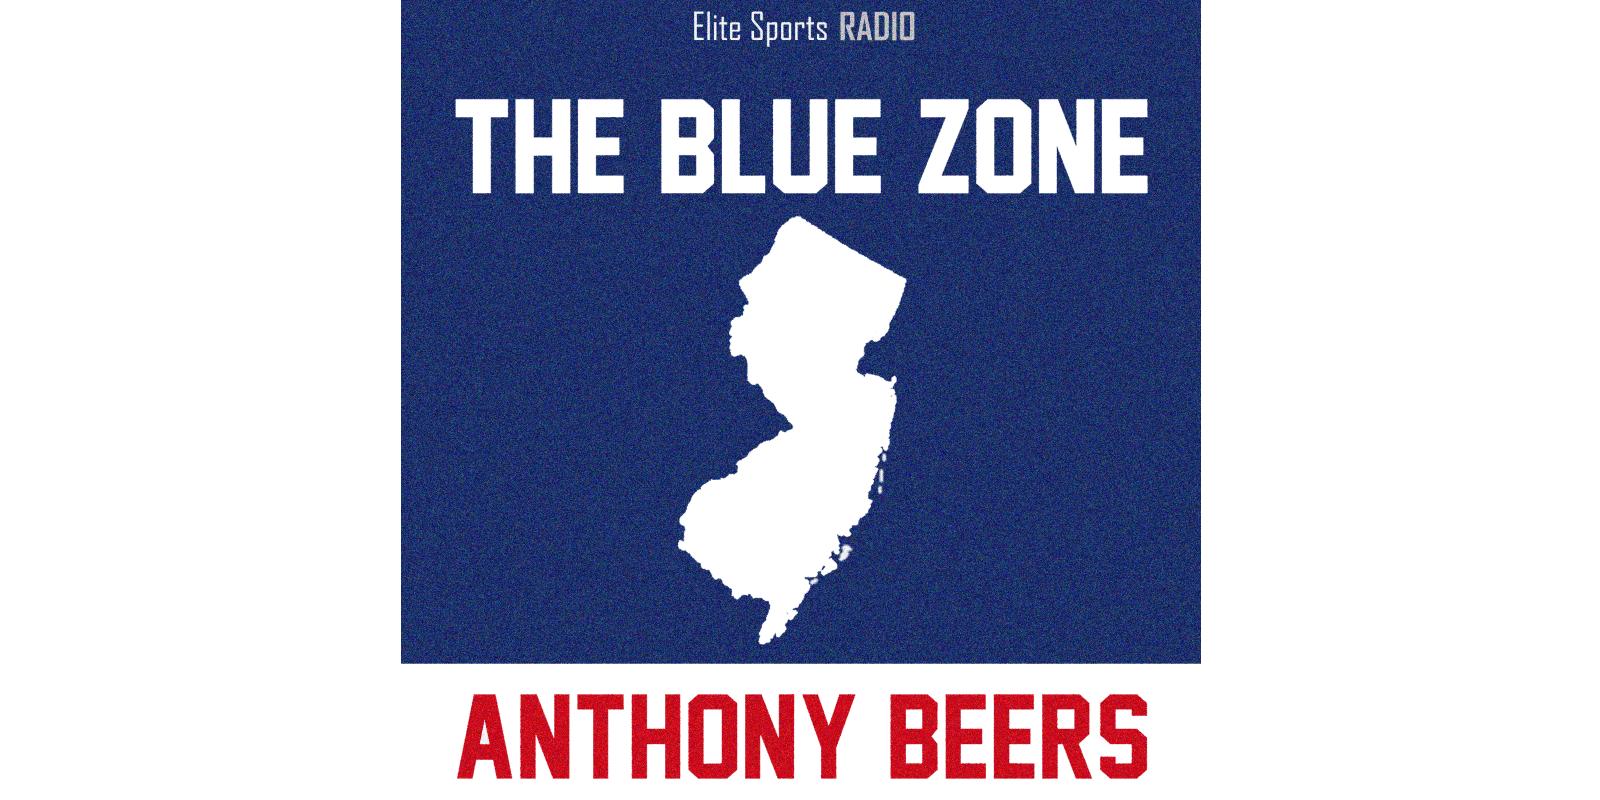 Elite Sports NY The Blue Zone Podcast 2